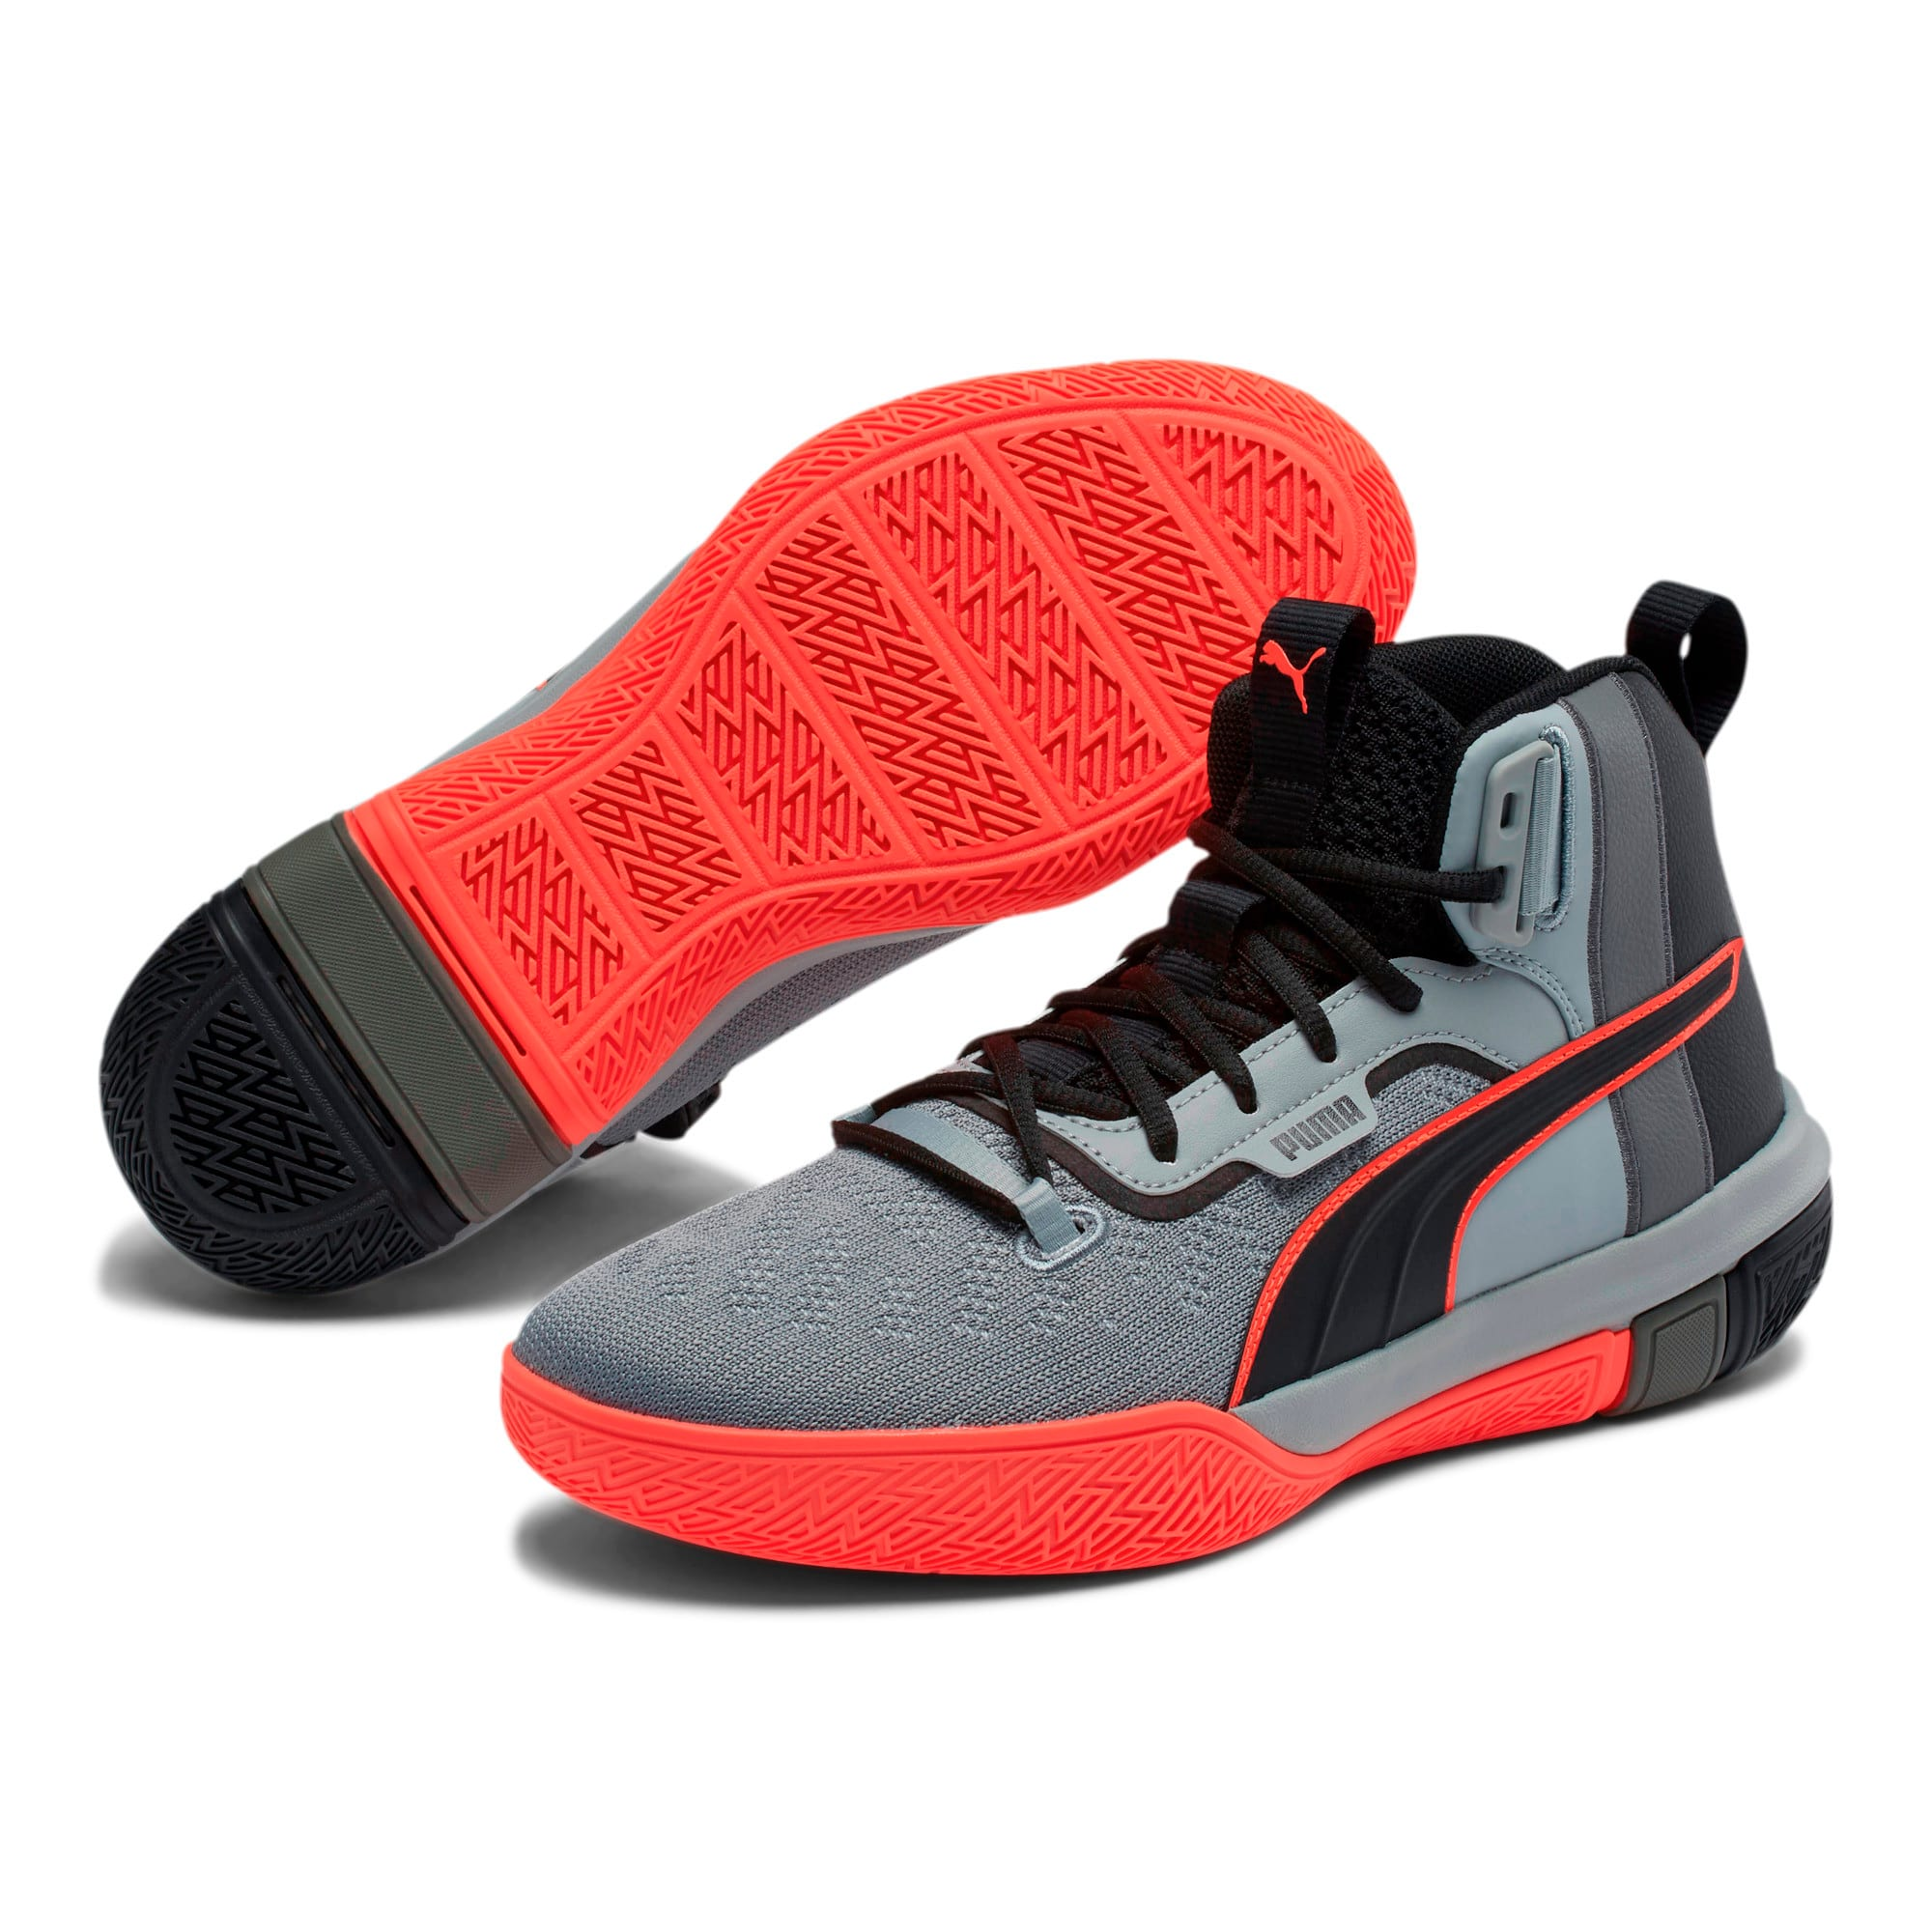 Thumbnail 2 of Legacy Disrupt Basketball Shoes, Puma Black-Red Blast, medium